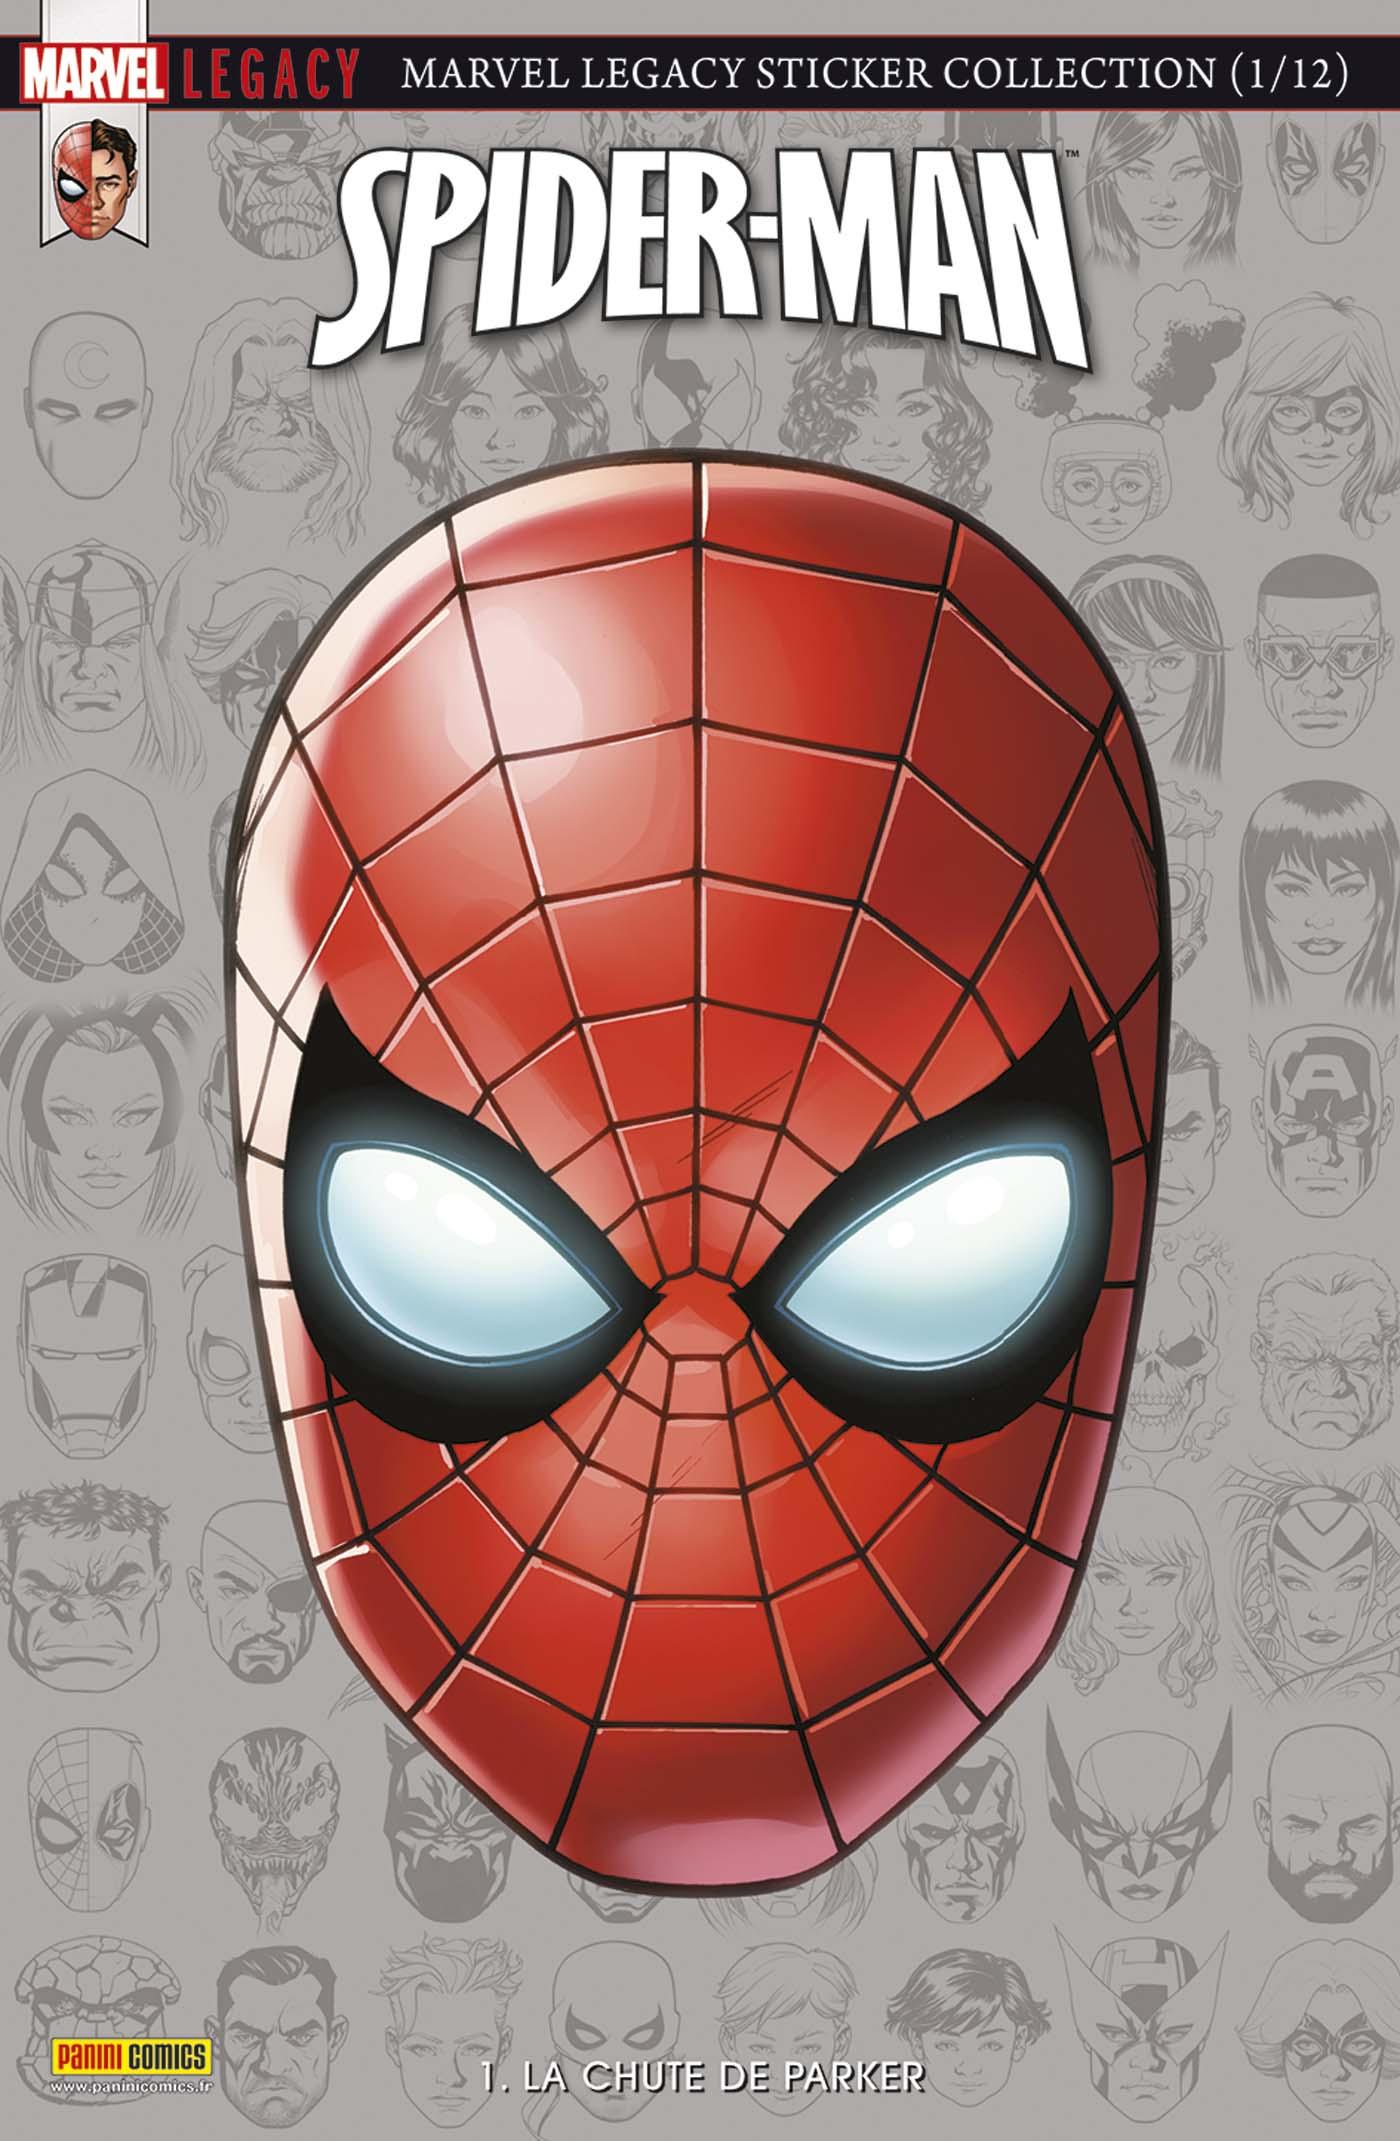 MARVEL LEGACY : SPIDER-MAN 1